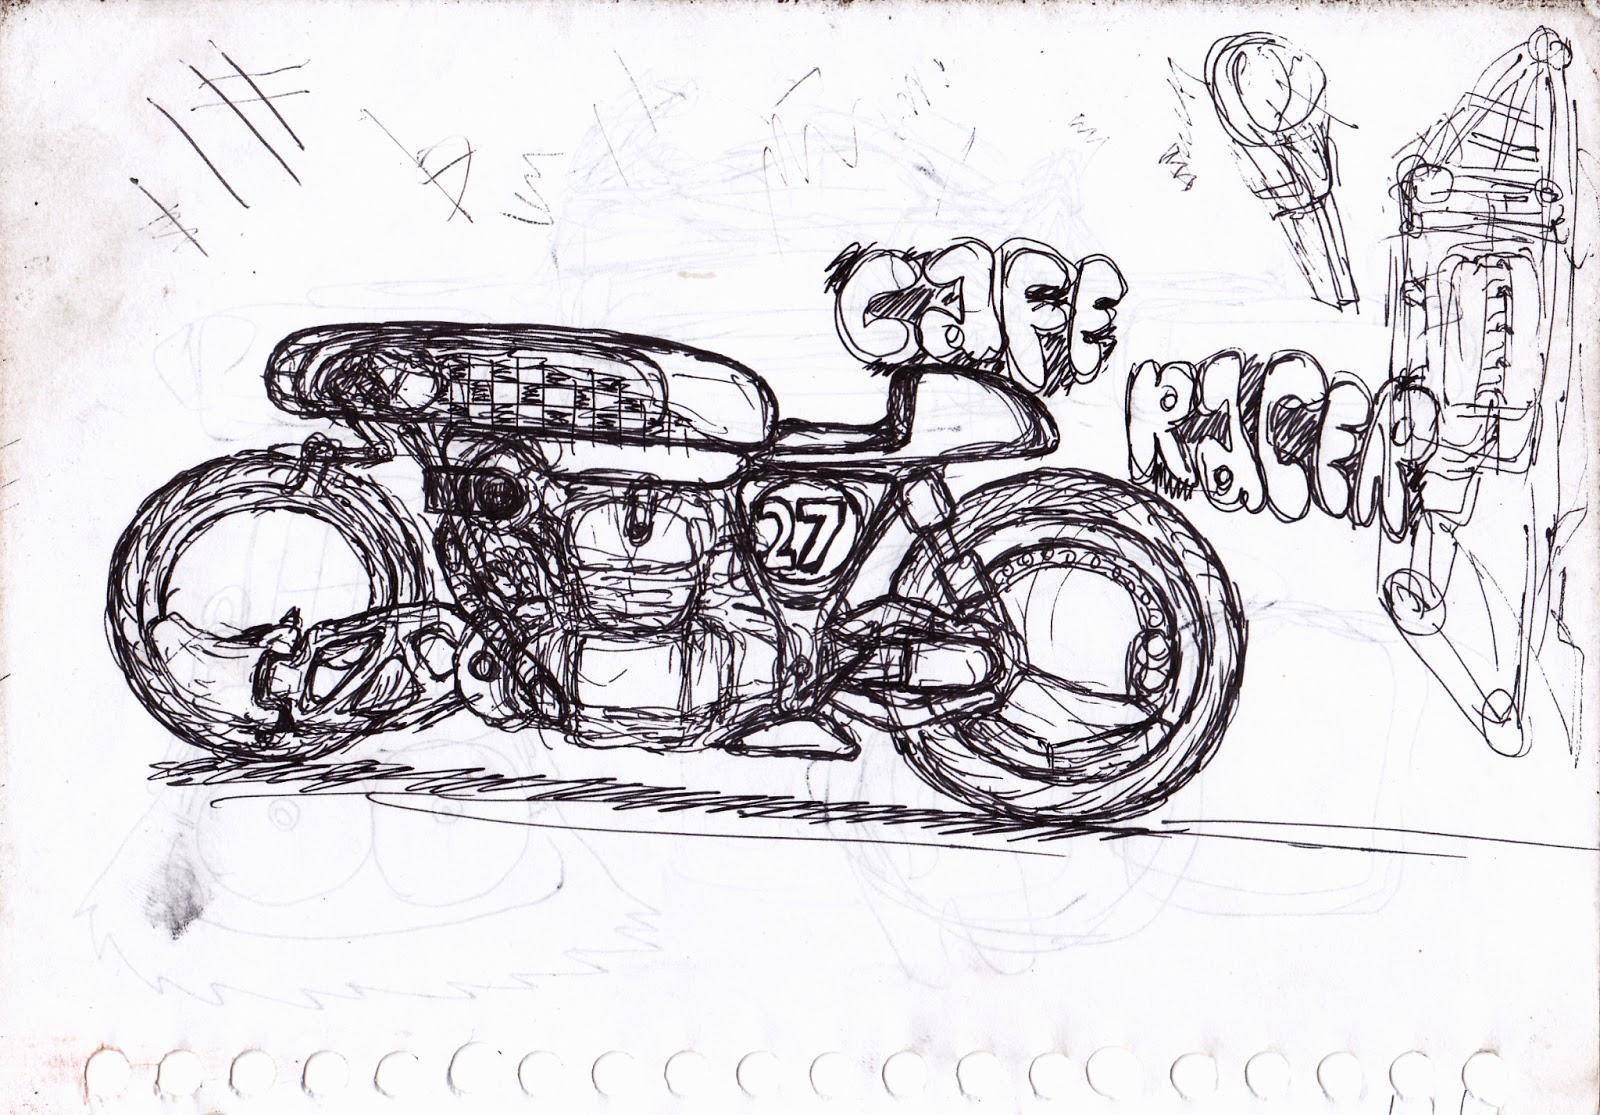 Motorcycle Sketch Motorcycle Sketch Part 2